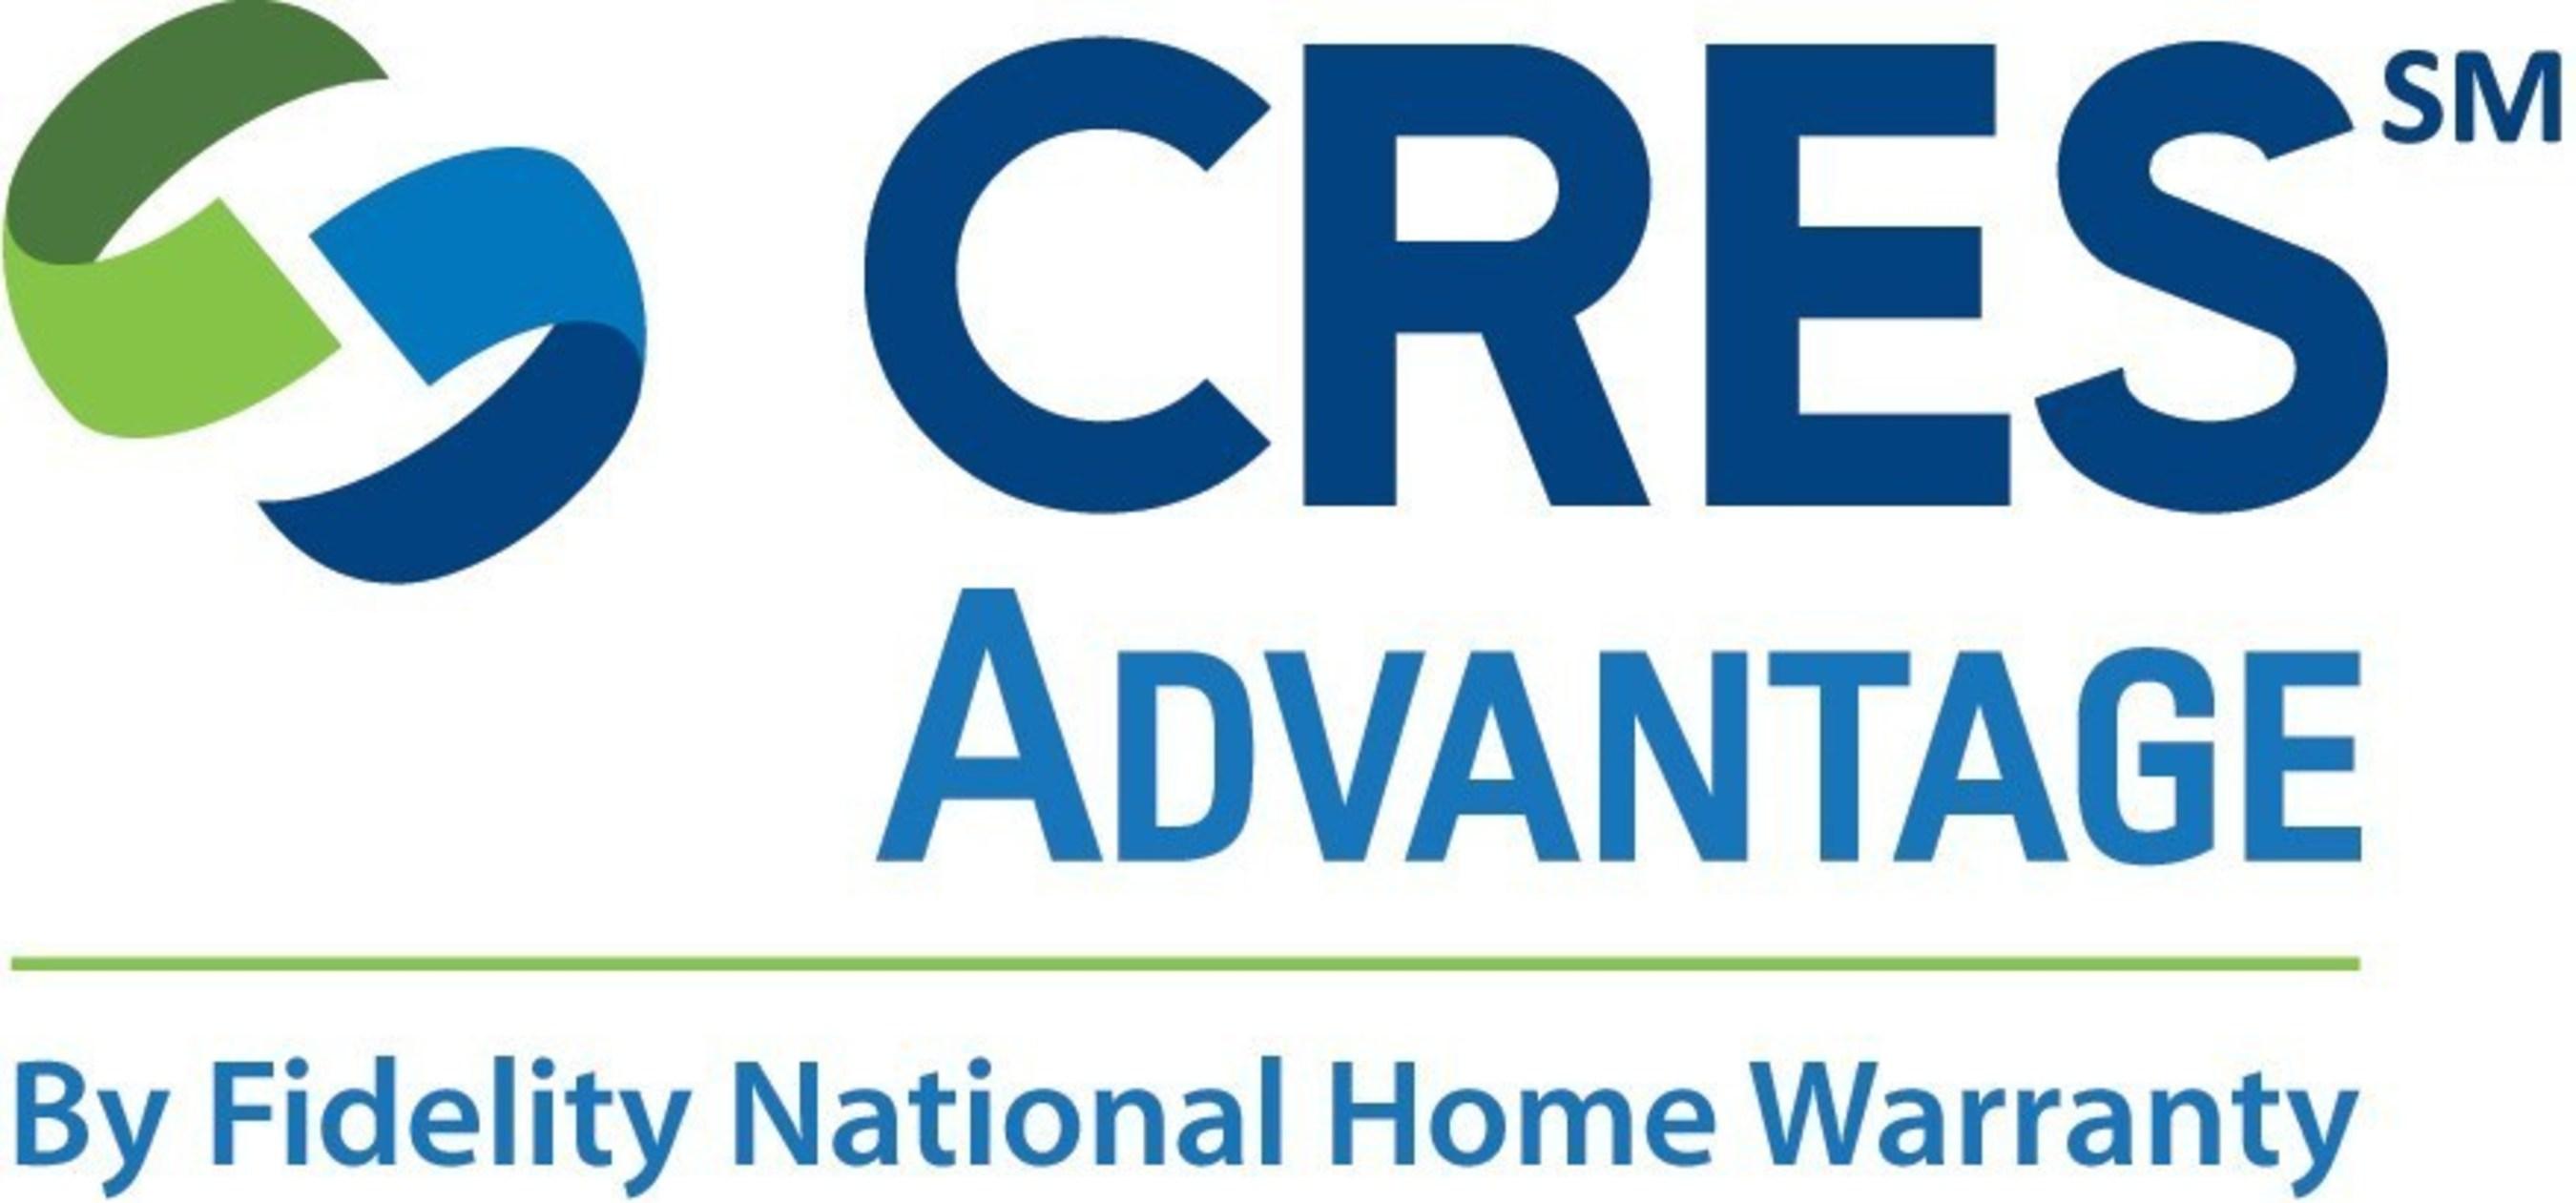 Fidelity National Home Warranty (FNHW) Forms Strategic Partnership ...